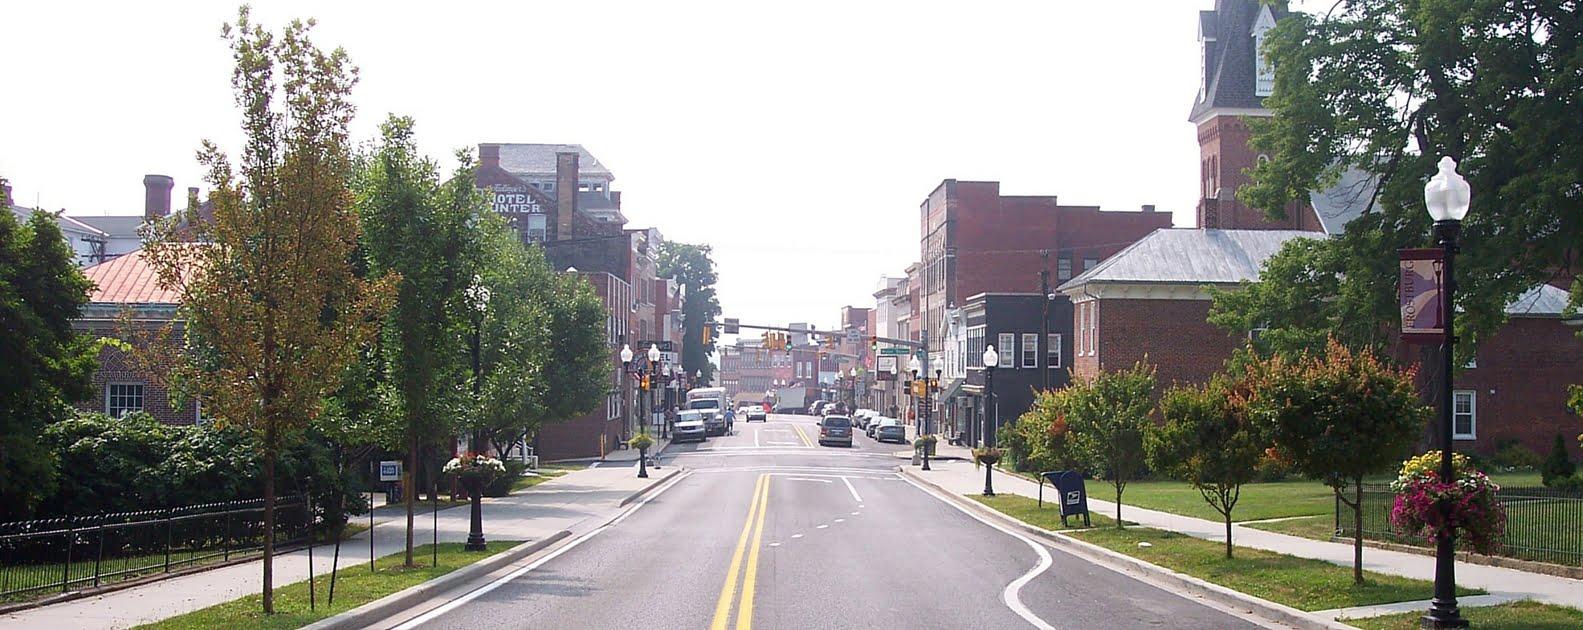 main street slider pic